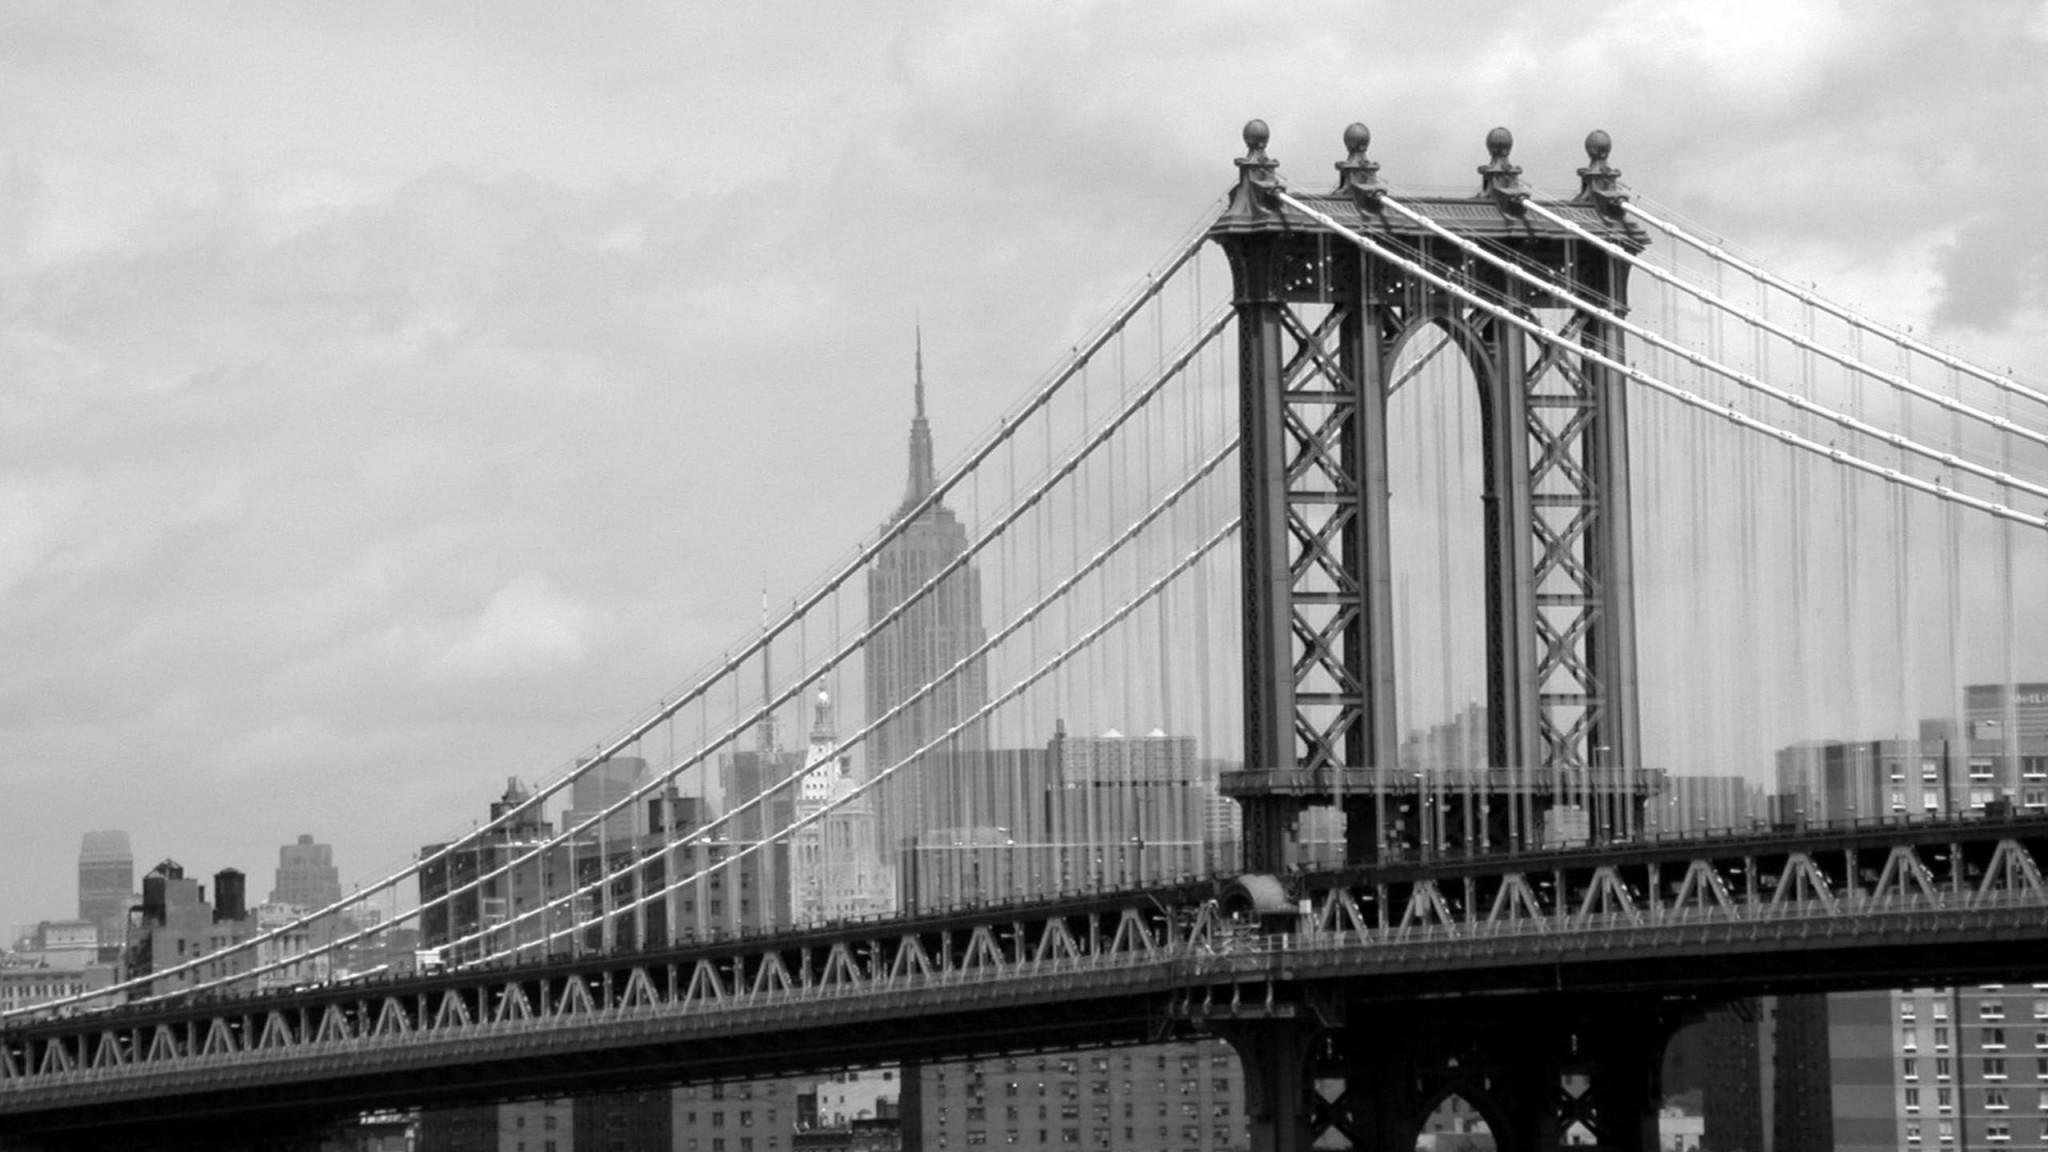 Manhattan  Bridge  New York  USA   us  HD Wallpaper